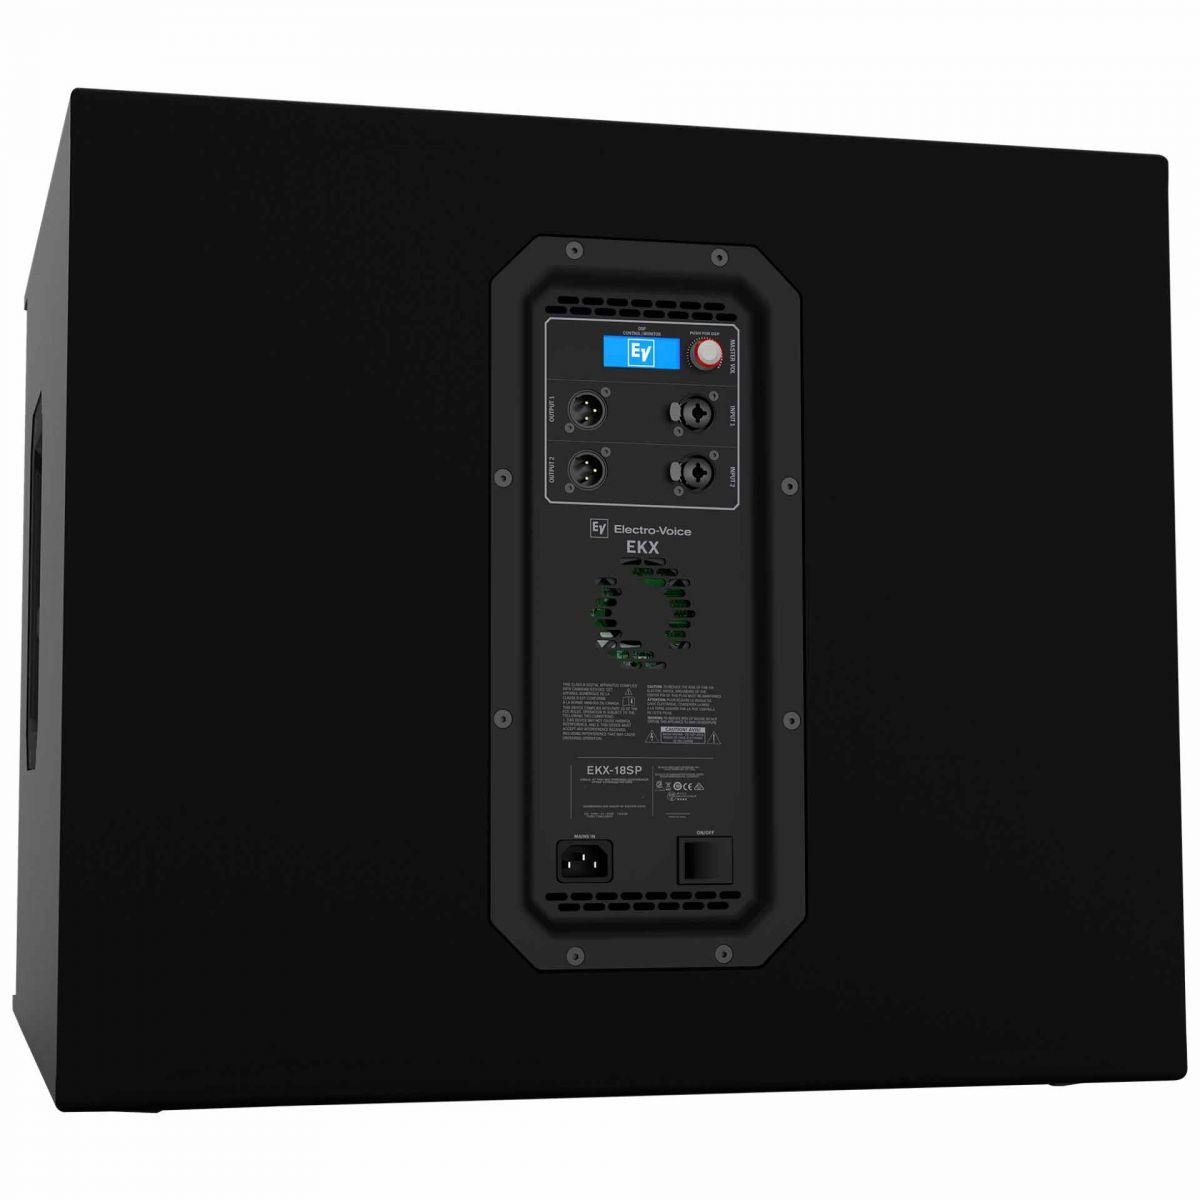 Subwoofer Ativo 1300W EKX 18SP US - Electro-Voice